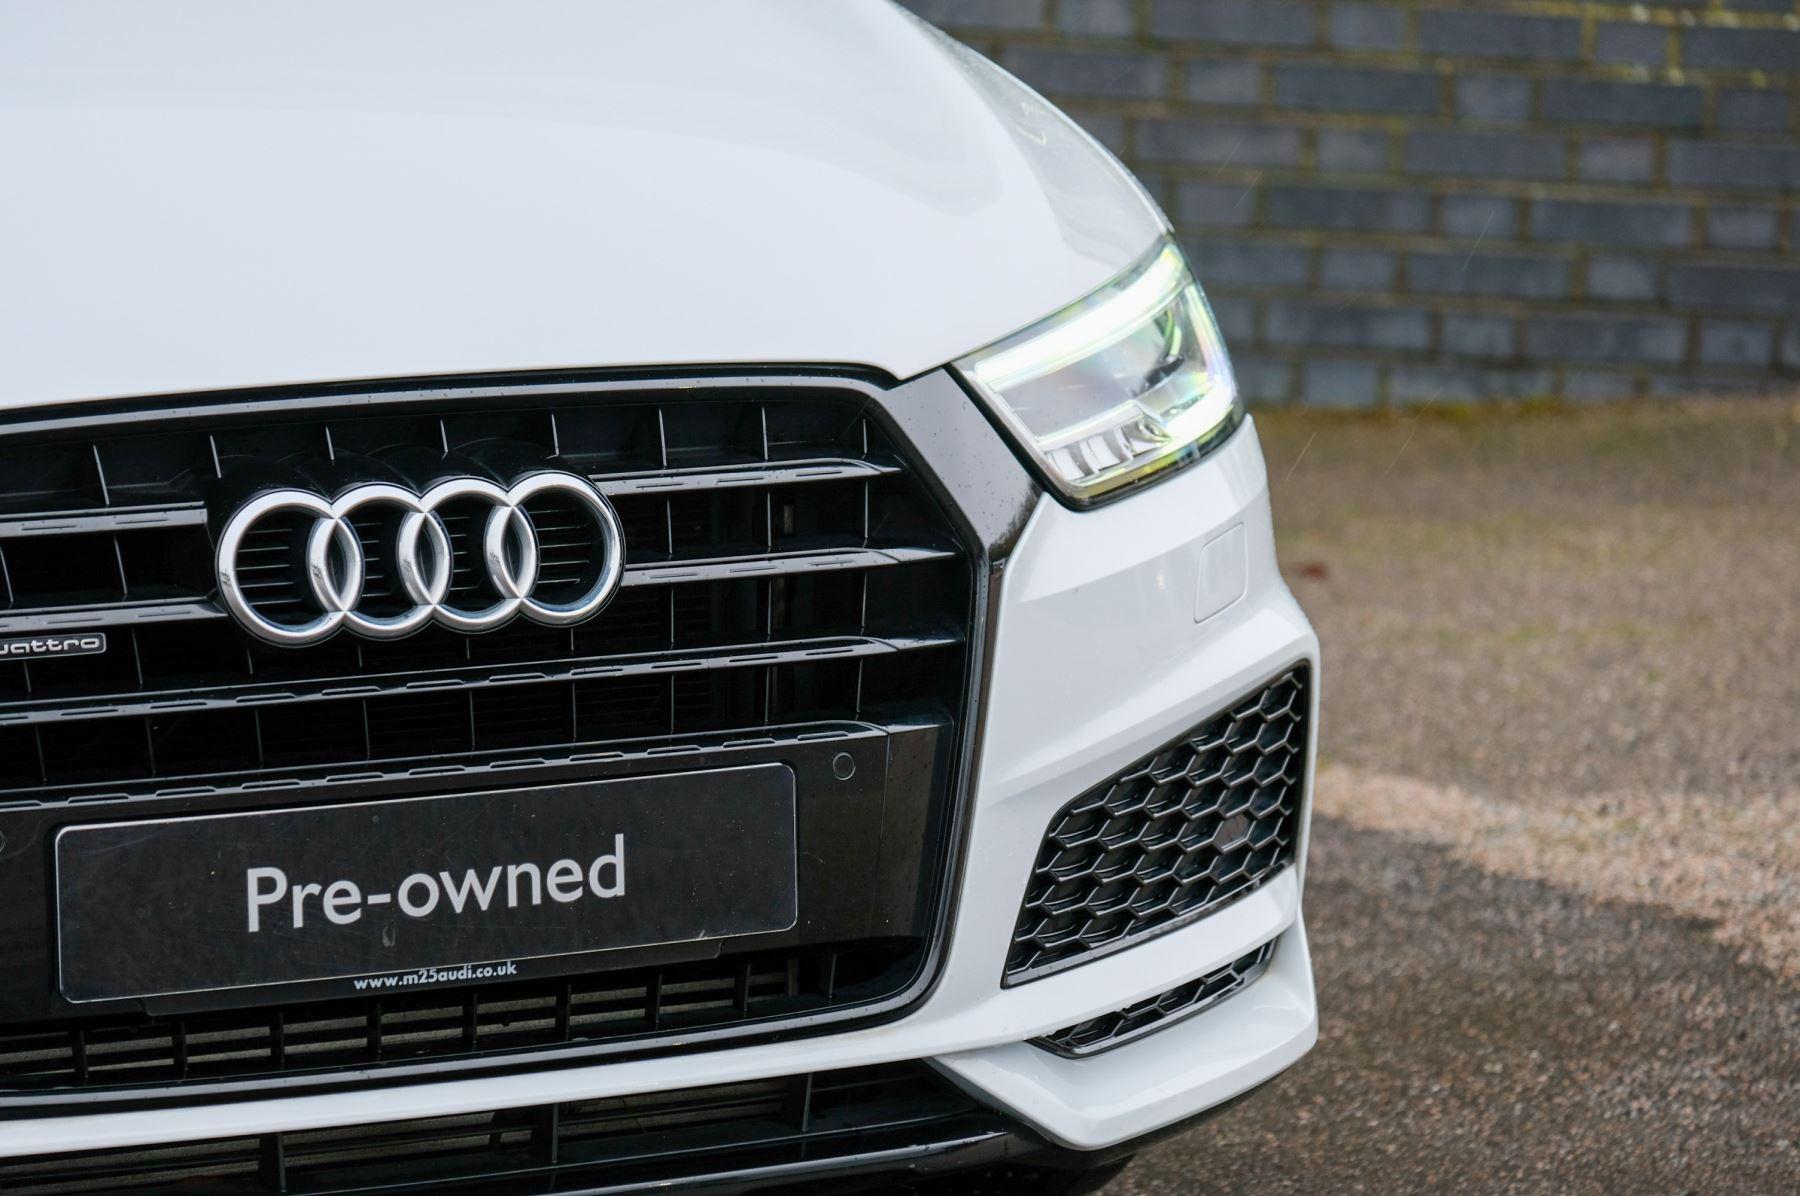 Audi Q3 2.0T FSI Quattro Black Edition 5dr S Tronic - Panoramic glass sunroof image 3